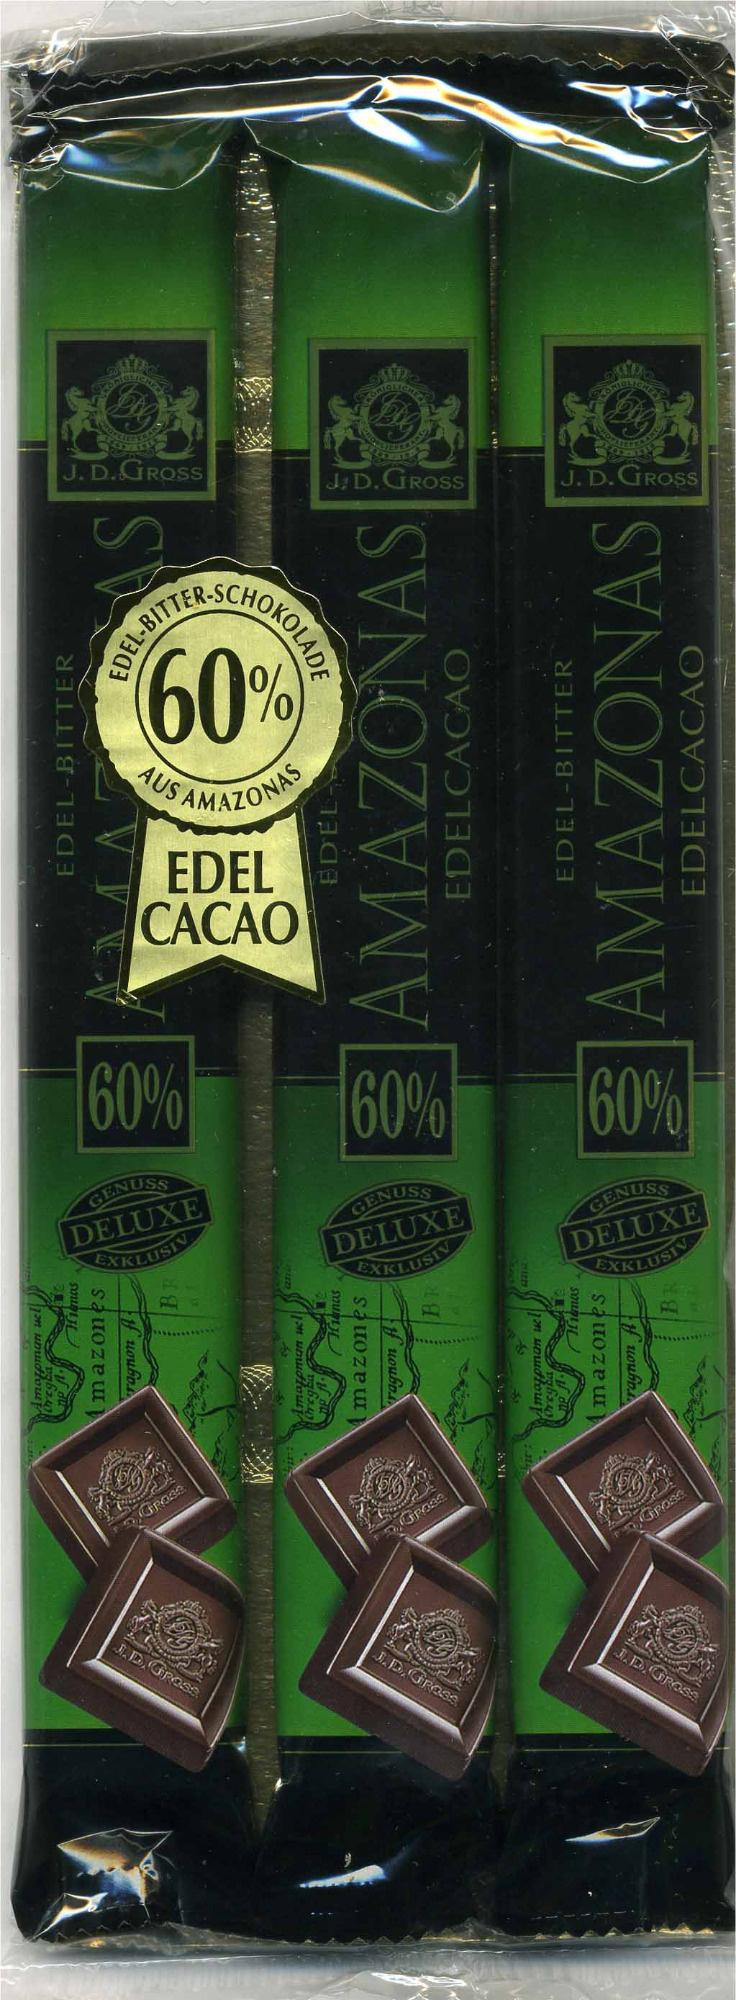 Edel-Bitter-Schokolade Amazonas 60% Kakao - Producto - es